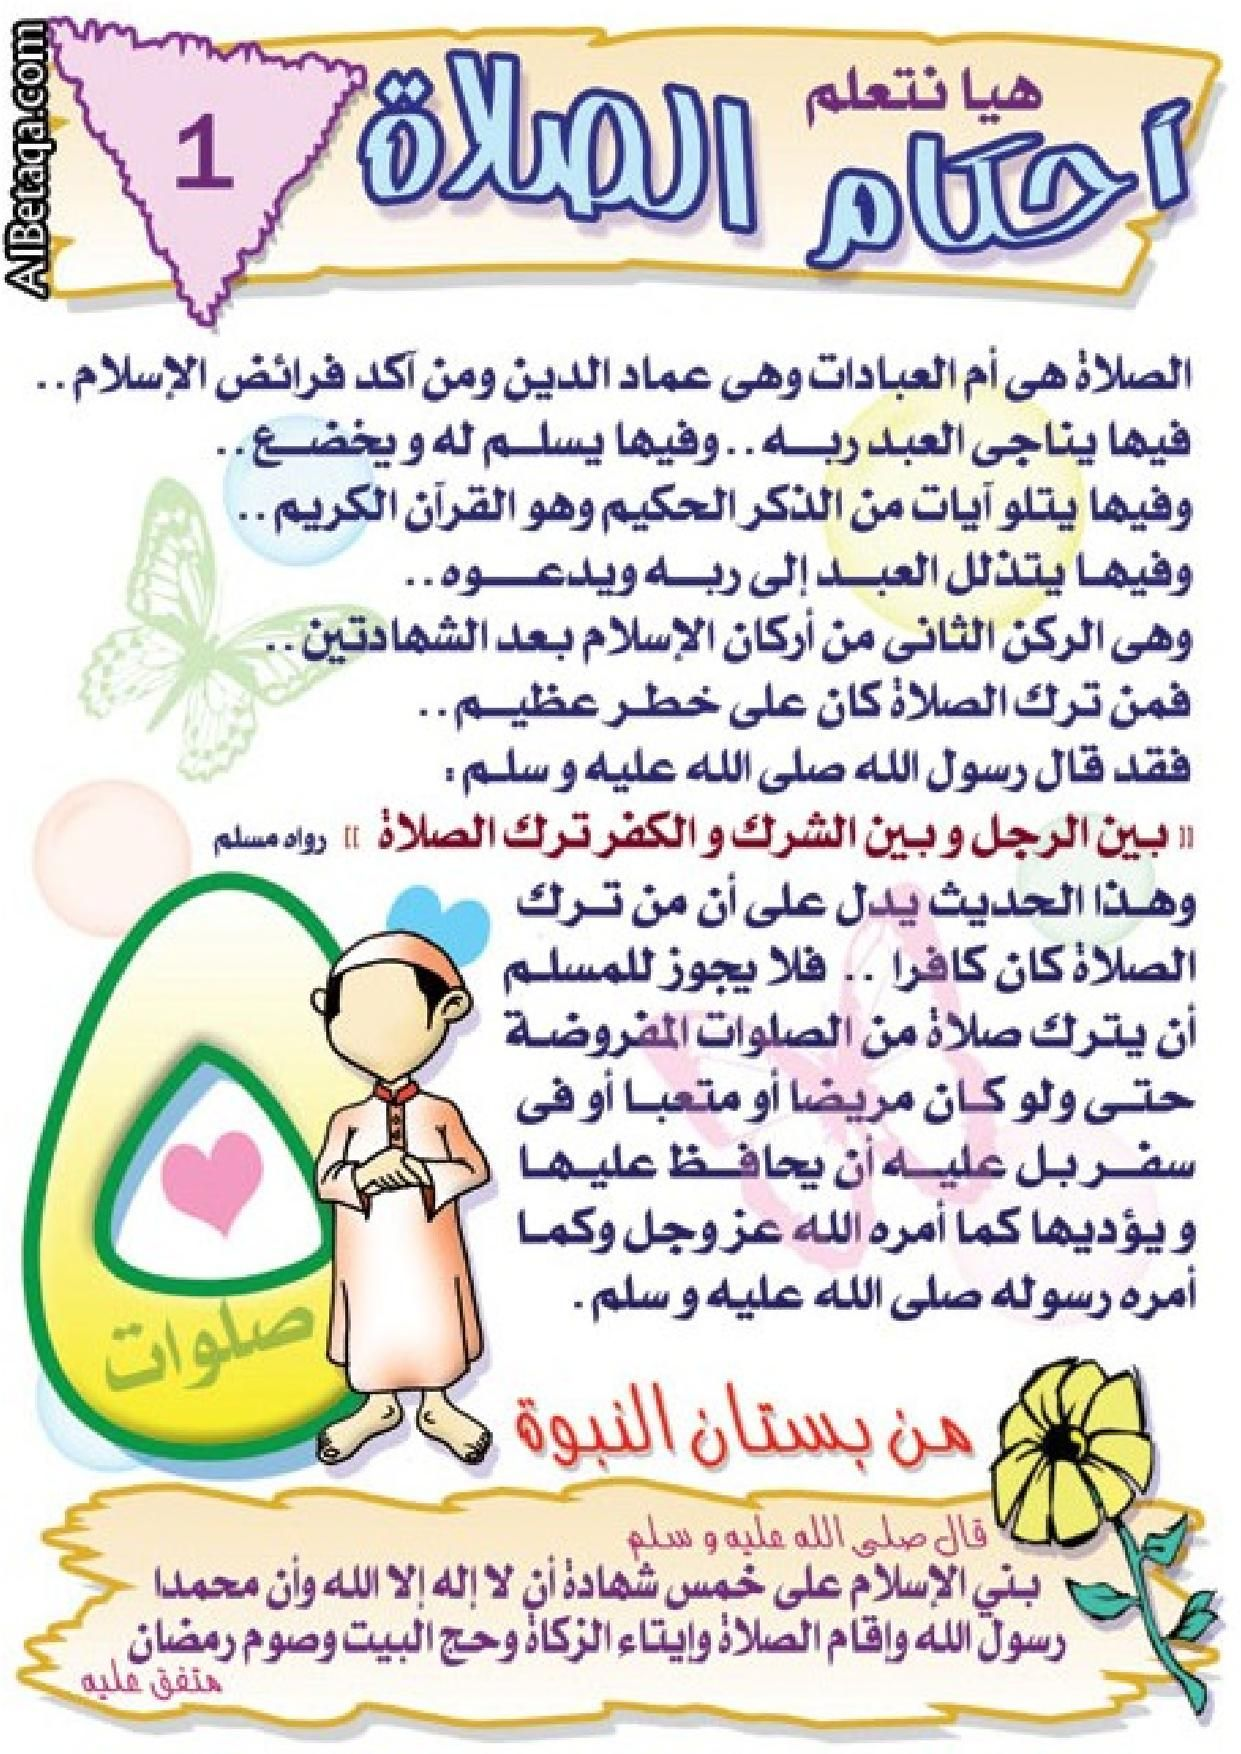 0197 كتاب صيغة مصورة اقرا اونلاين أحكام الصلاة Free Download Borrow And Streaming Internet Archiv Islamic Inspirational Quotes Islam For Kids Learn Islam